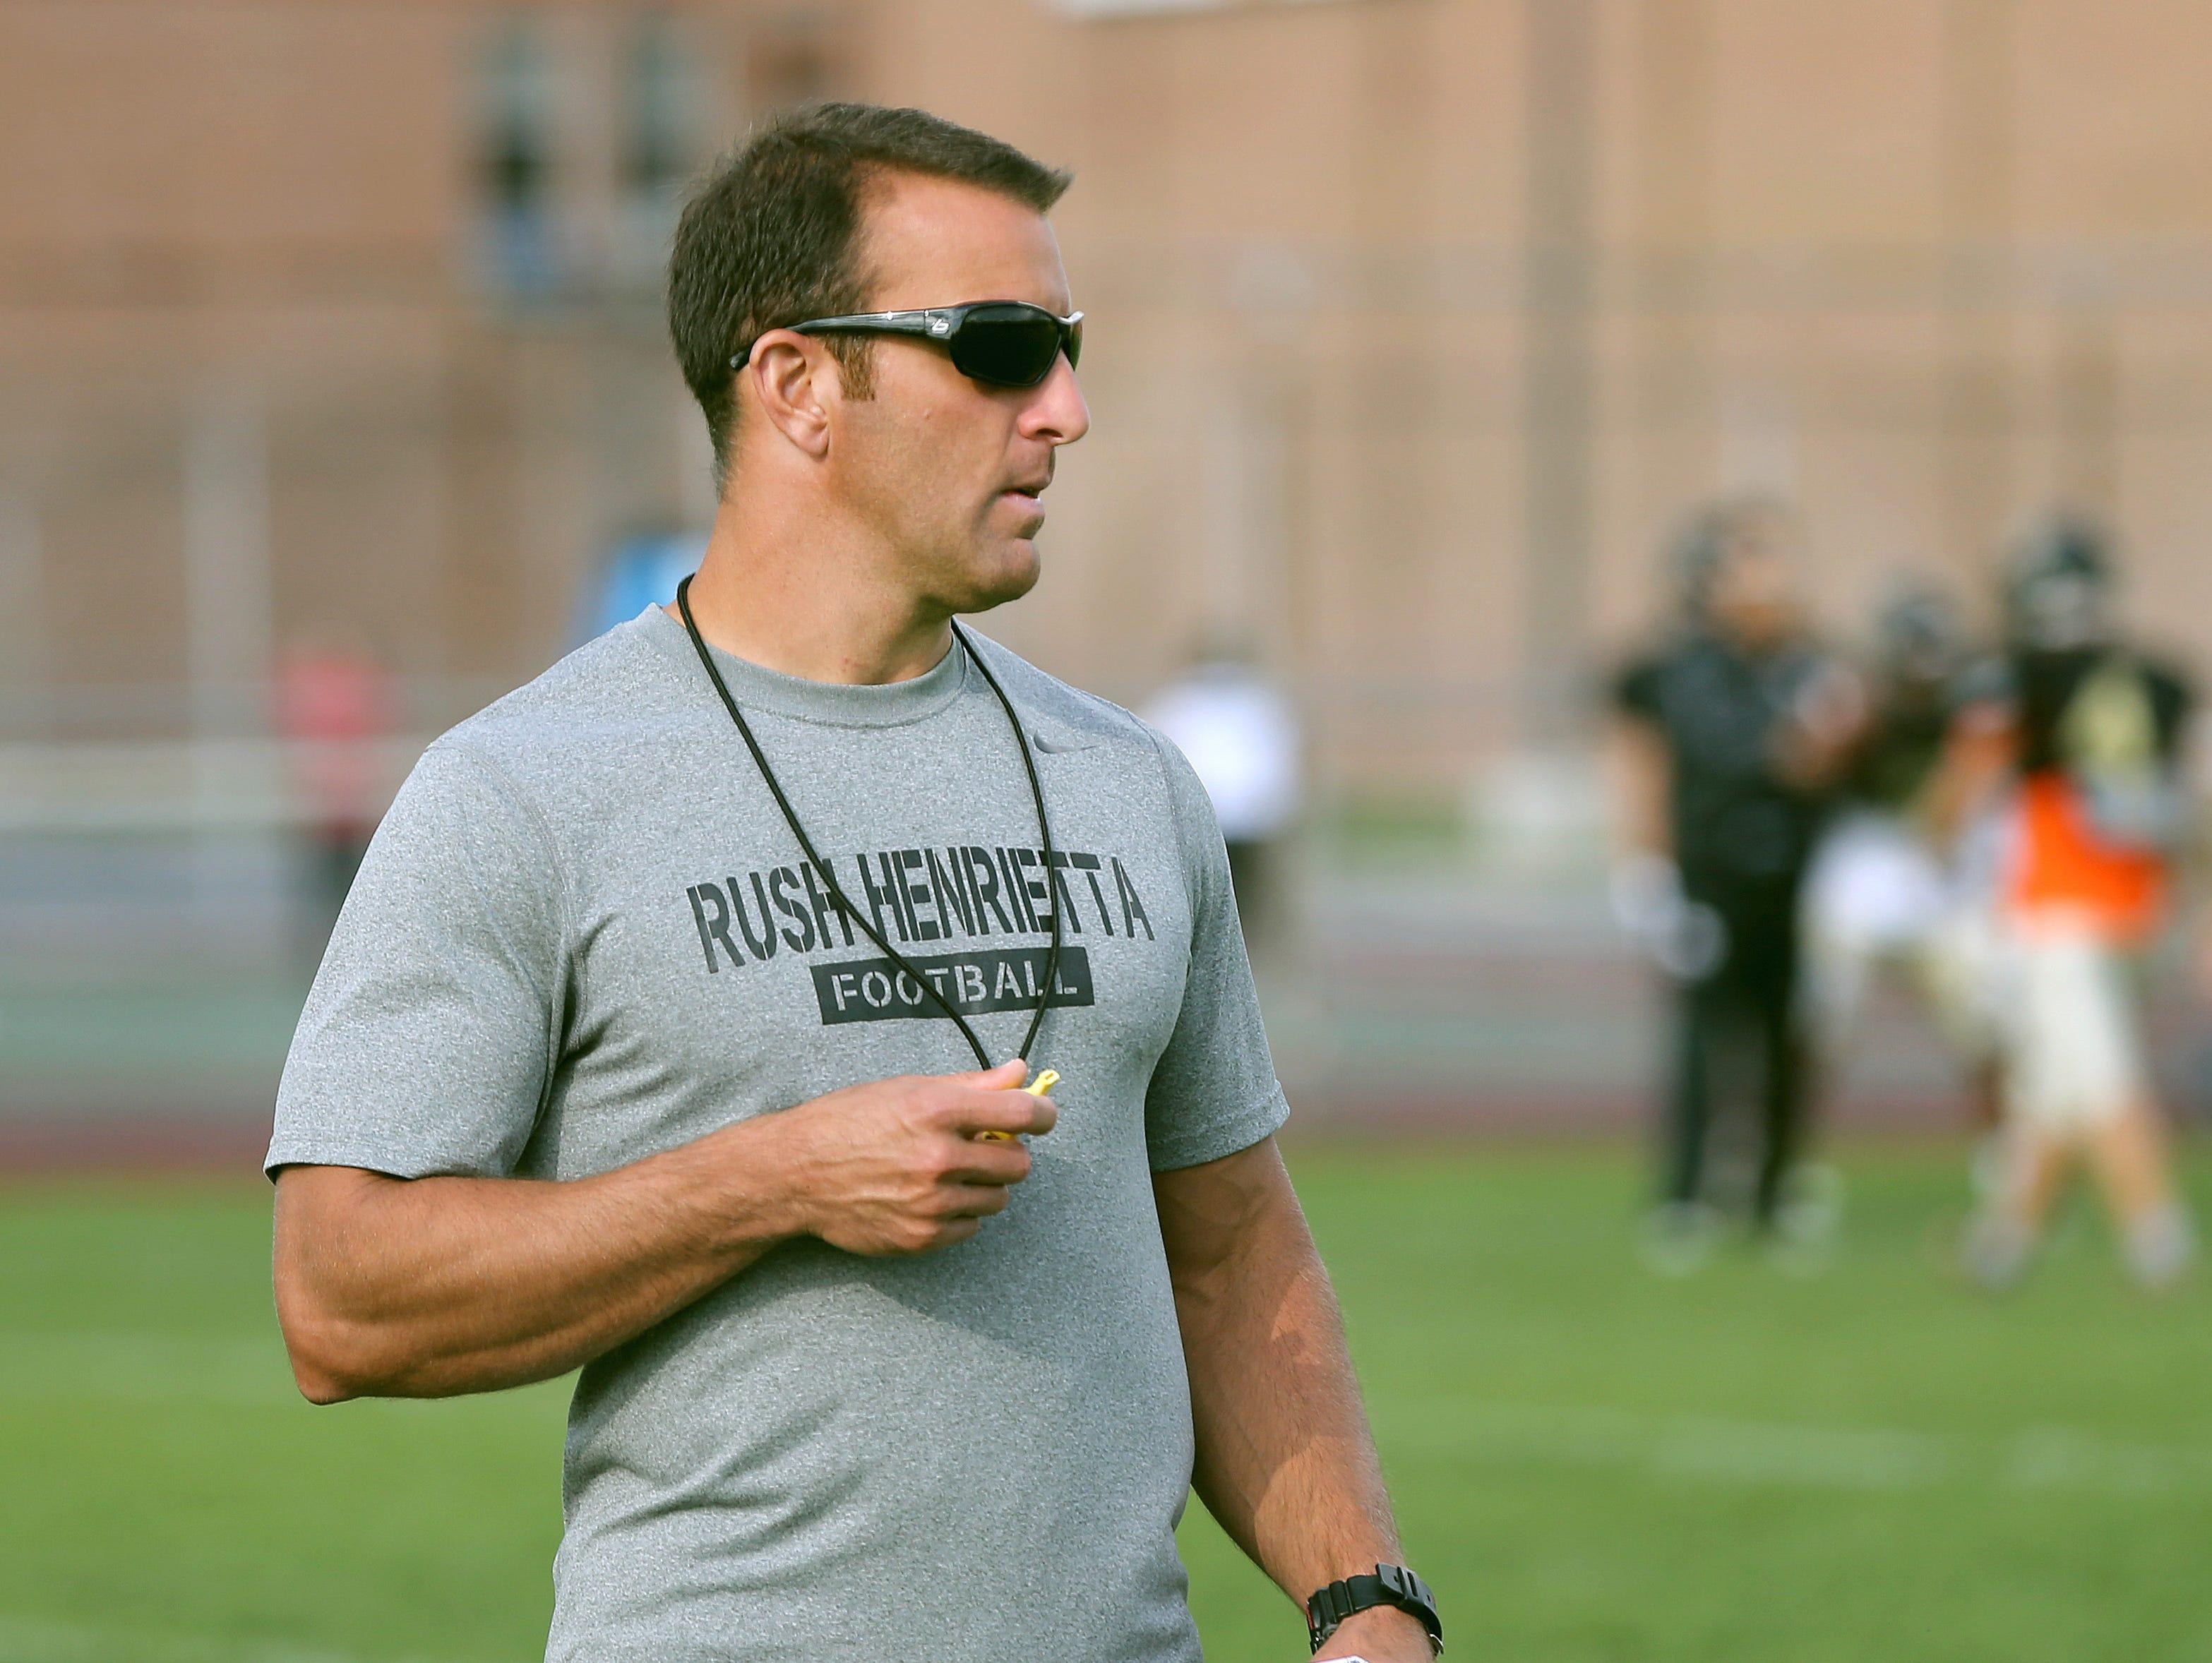 Rush-Henrietta head football coach Joe Montesano is the latest winner of the Coaches Who Care award.